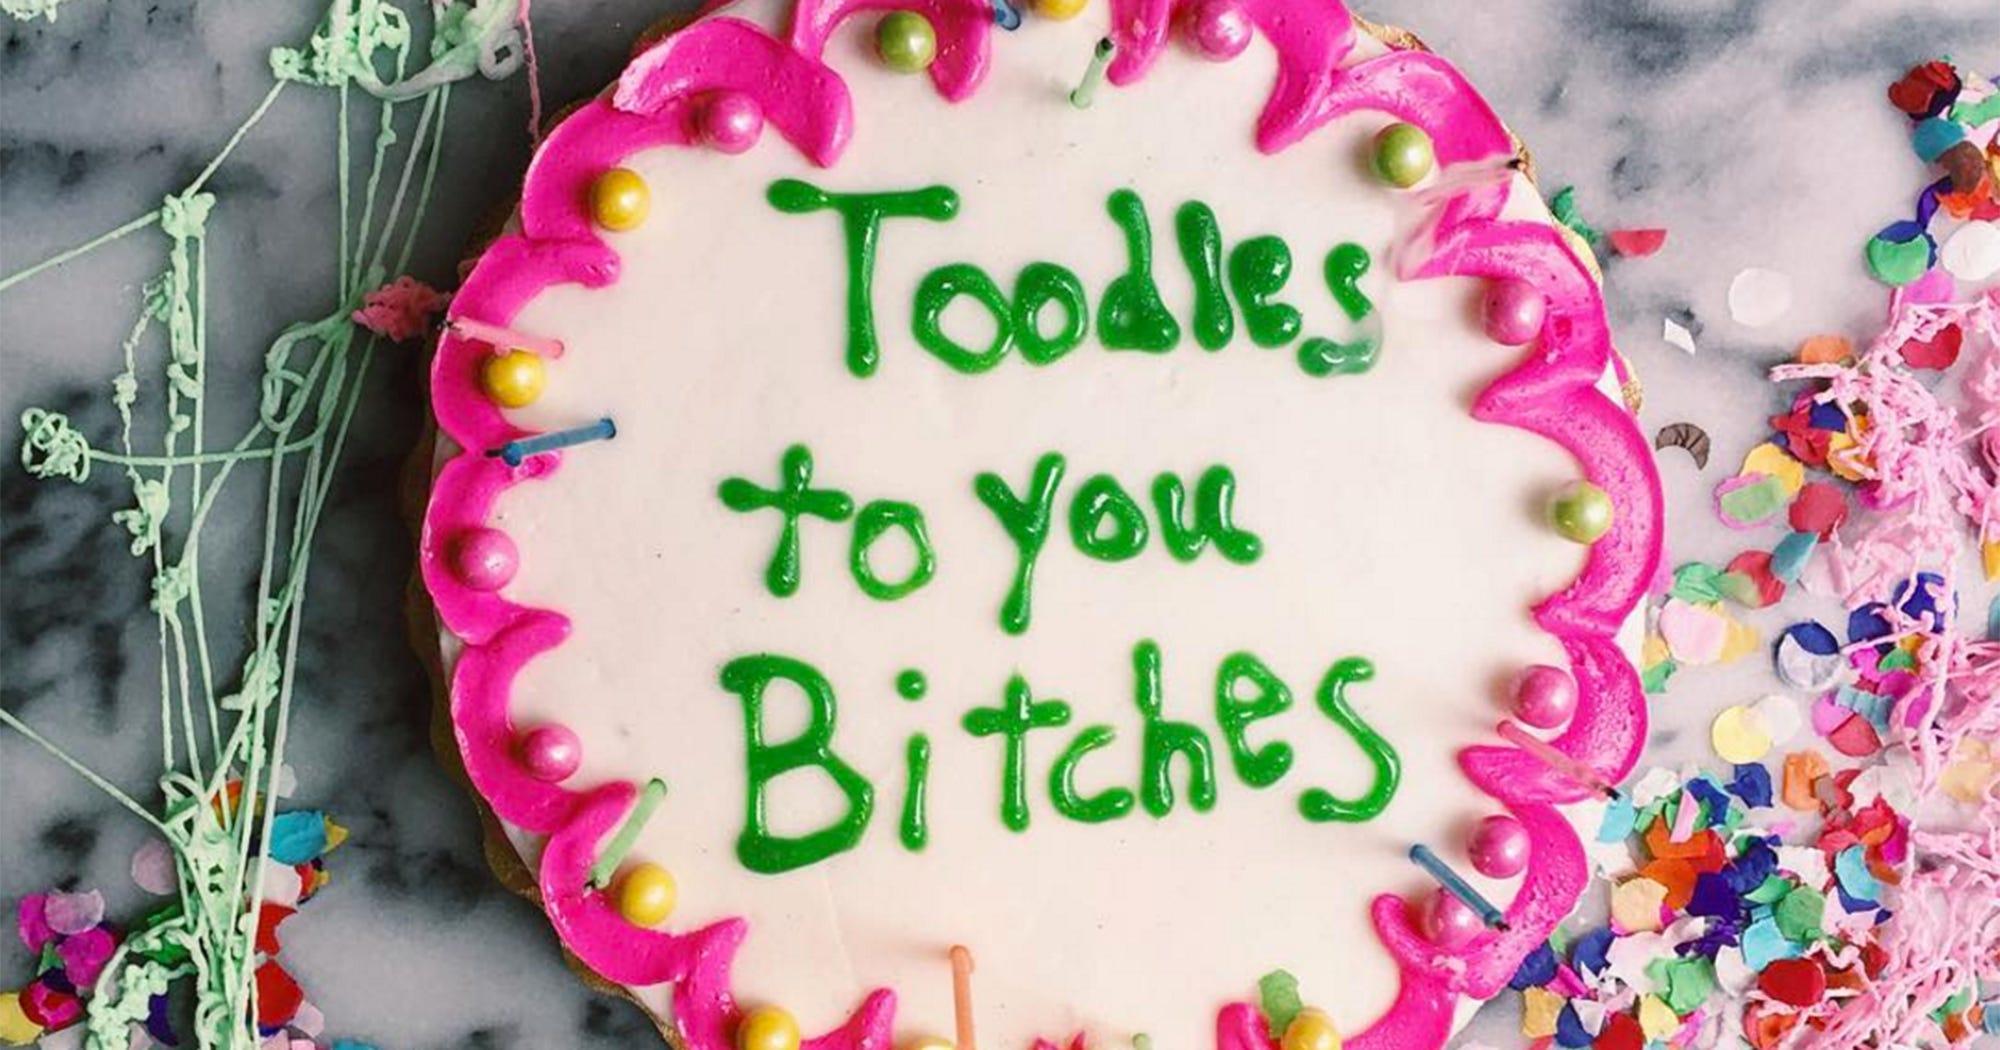 Admirable Drake Lyrics On Cake By Joy The Baker Funny Birthday Cards Online Alyptdamsfinfo